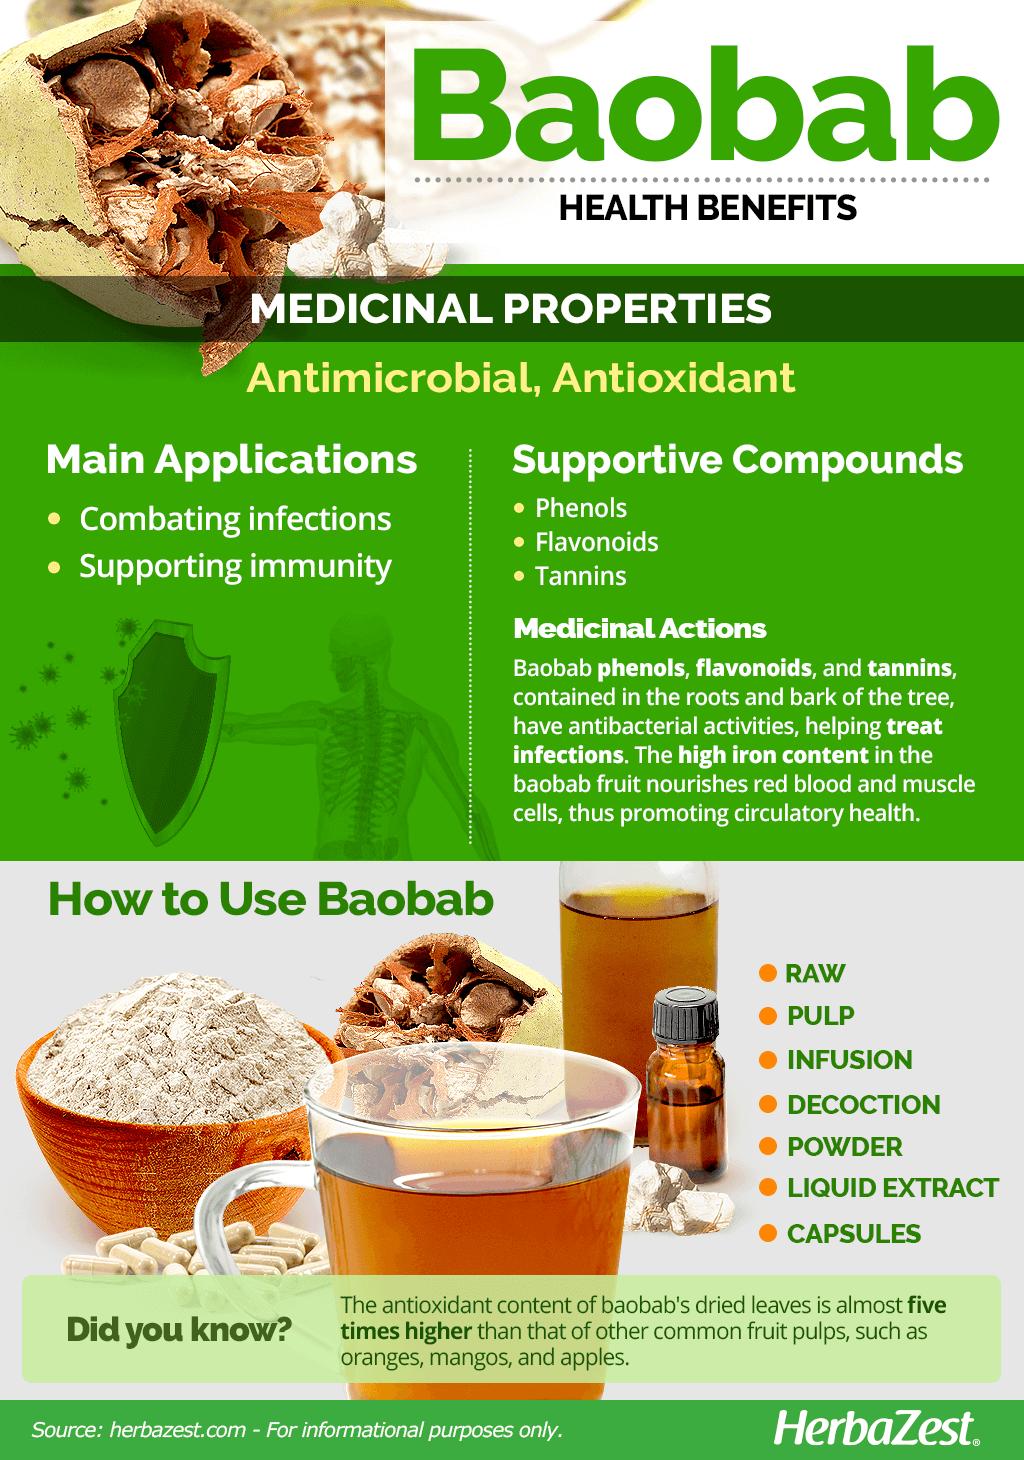 Baobab Benefits